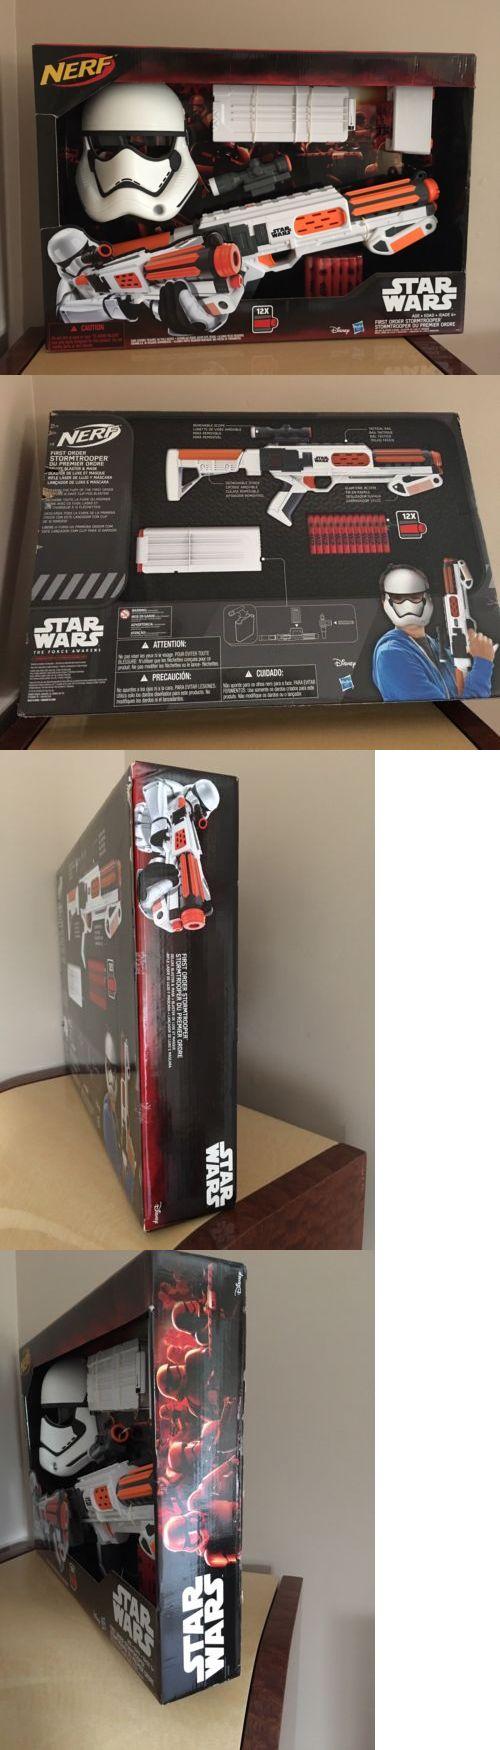 Dart Guns and Soft Darts 158749: Nerf Star War Episode Vii -> BUY IT NOW ONLY: $45 on eBay!